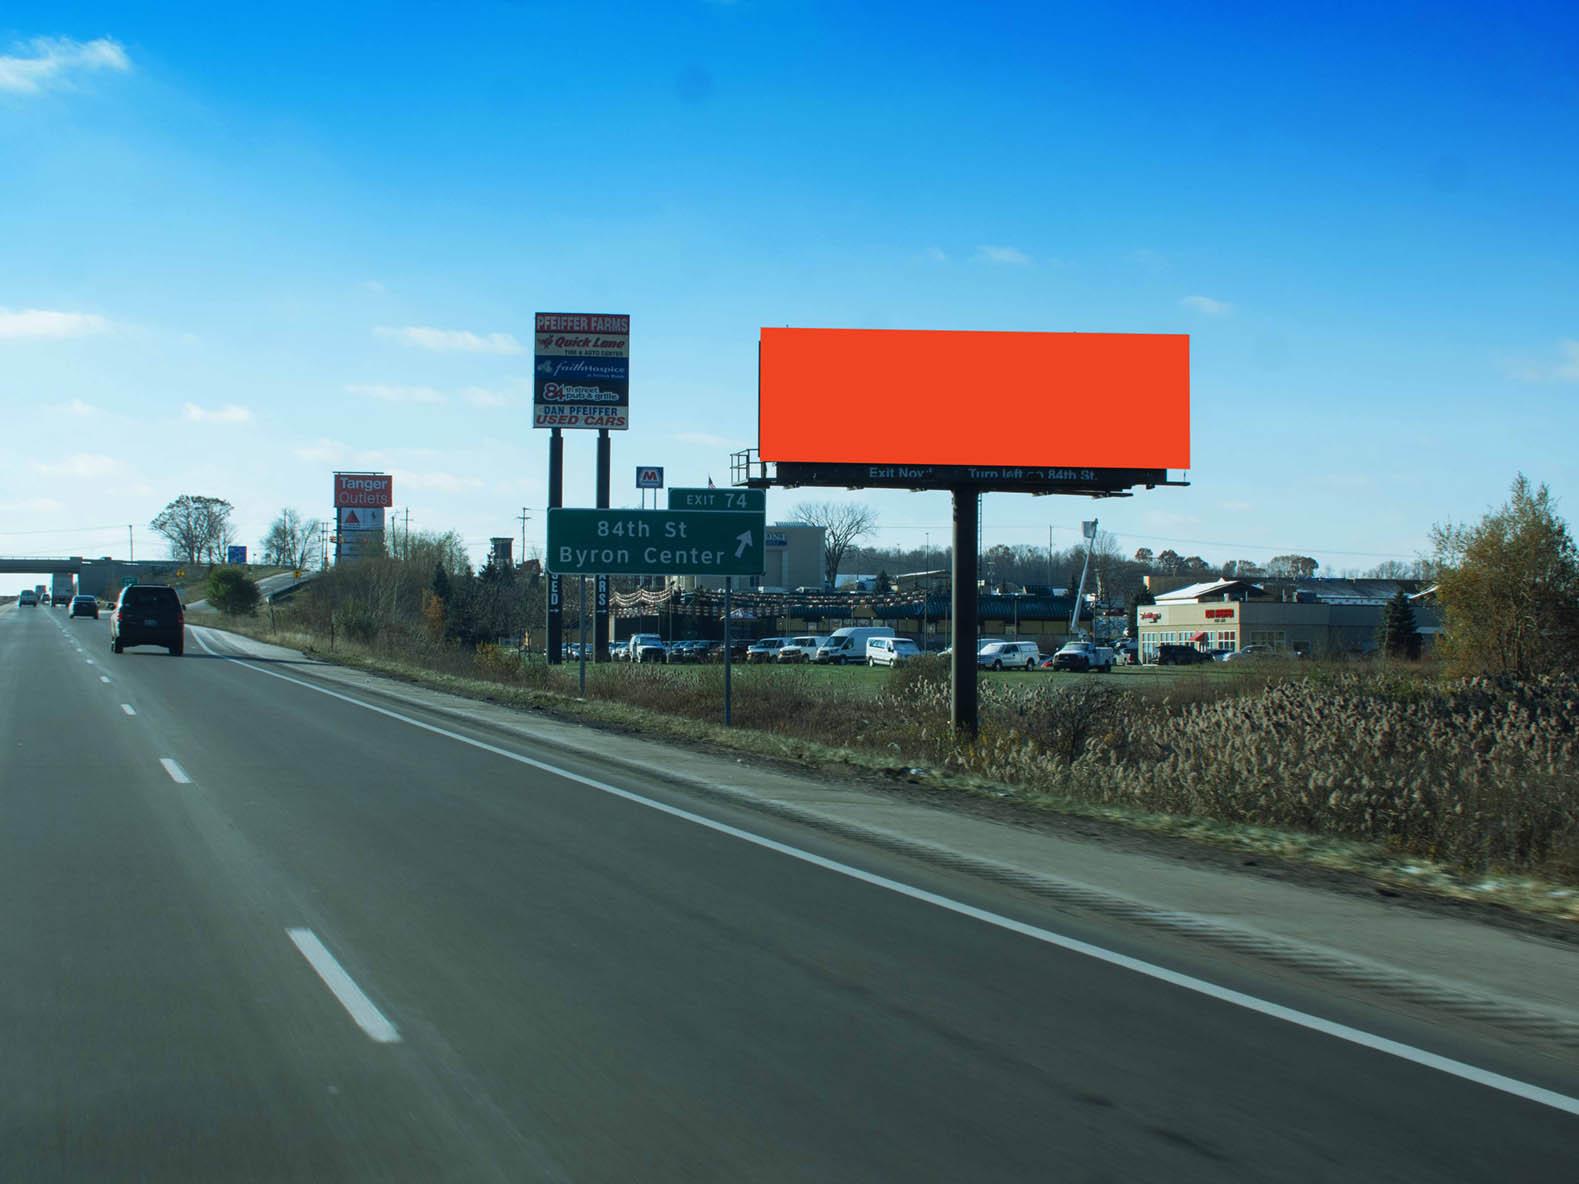 Billboard 110 North (14 x 48) - Geopath: 30752121